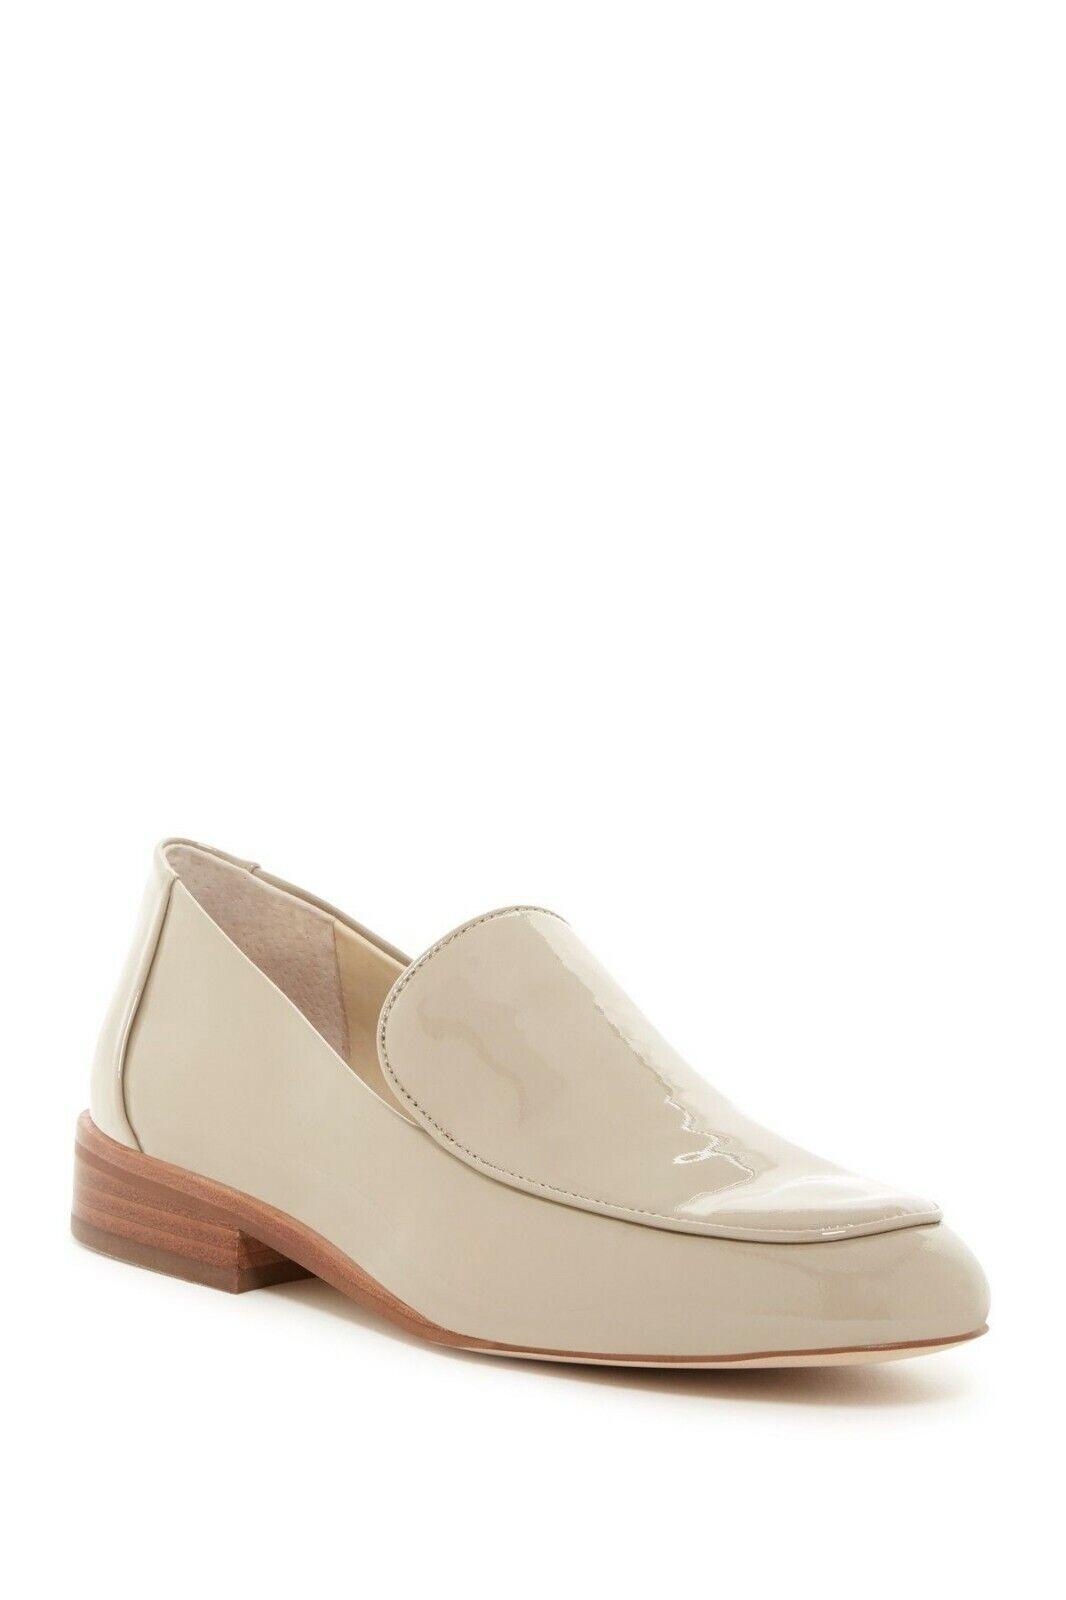 NEW Louise et Cie Beran Patent Loafer, Beige Patent, Women Size  5 M  79